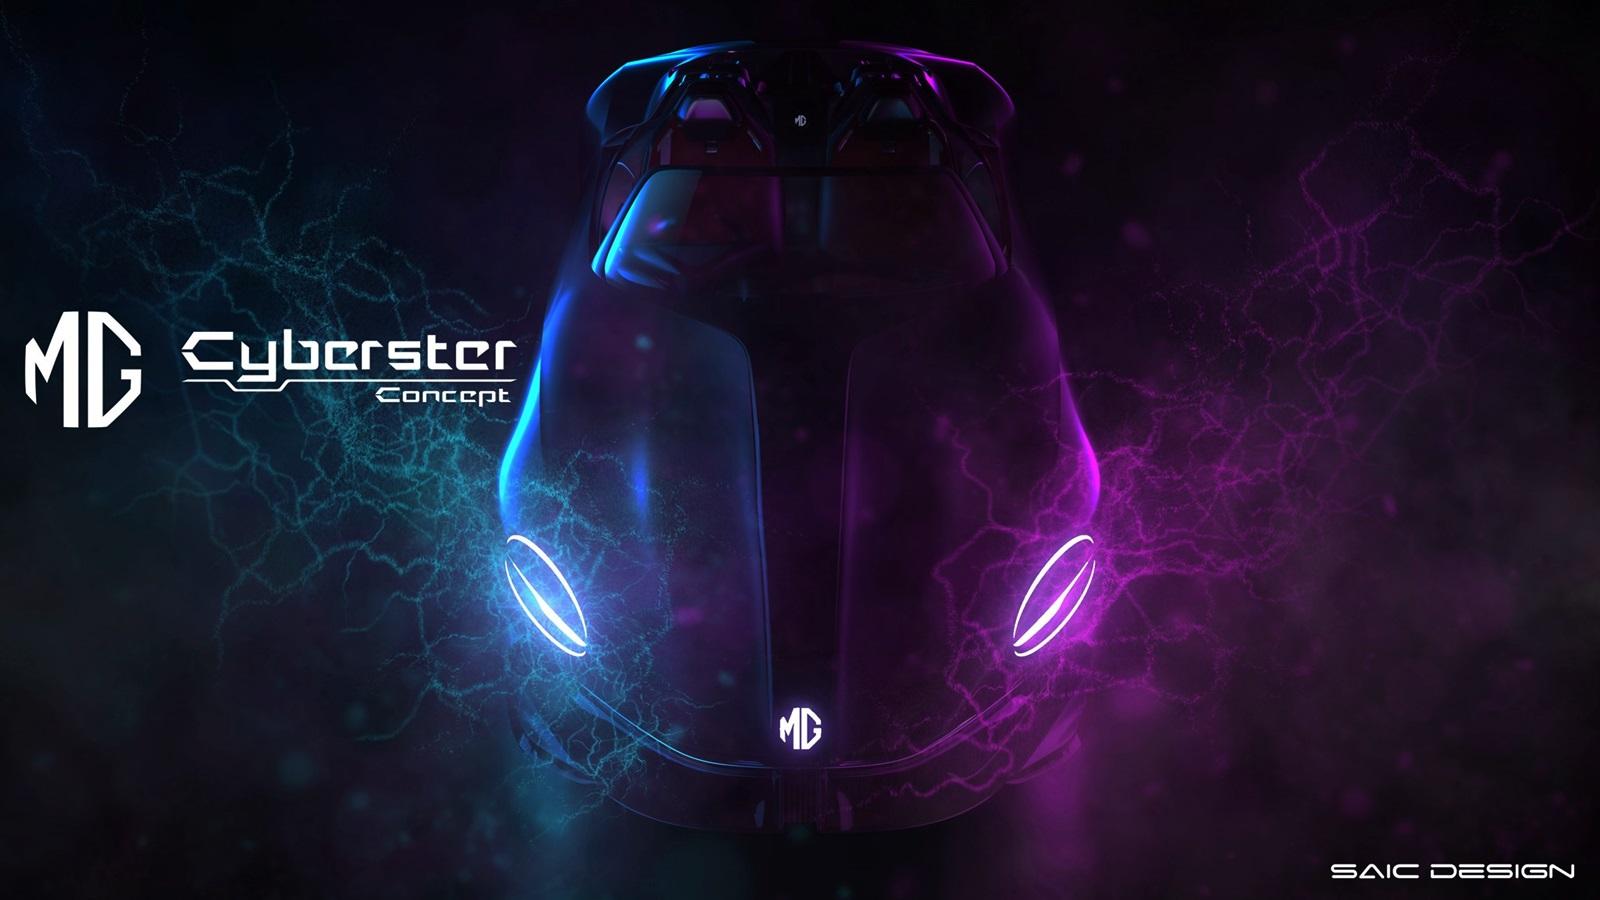 Mg Cyberster (3)